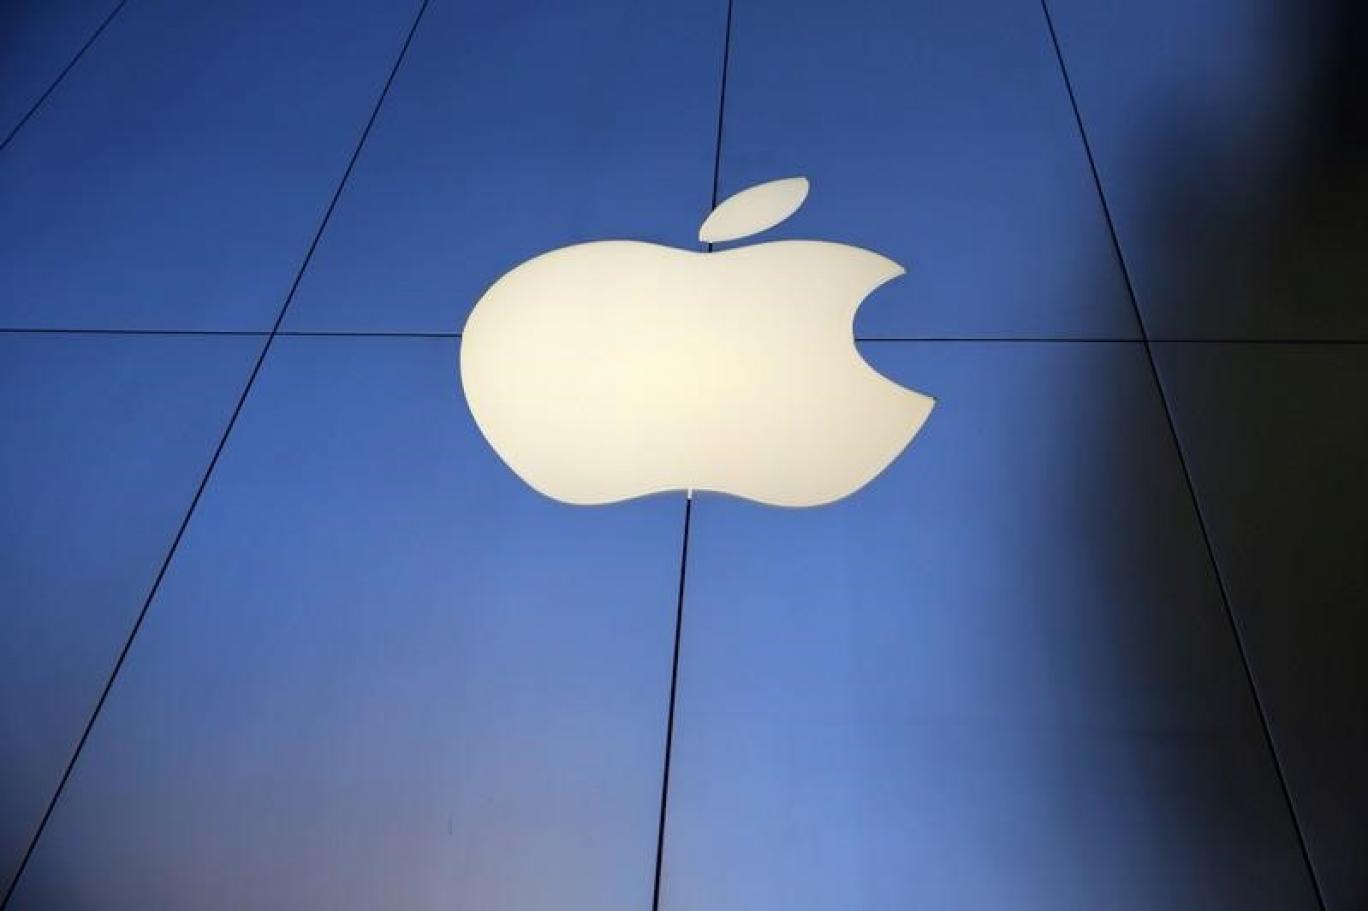 آبل تطلق نظام MacOS Catalina وتعلن نهاية iTunes